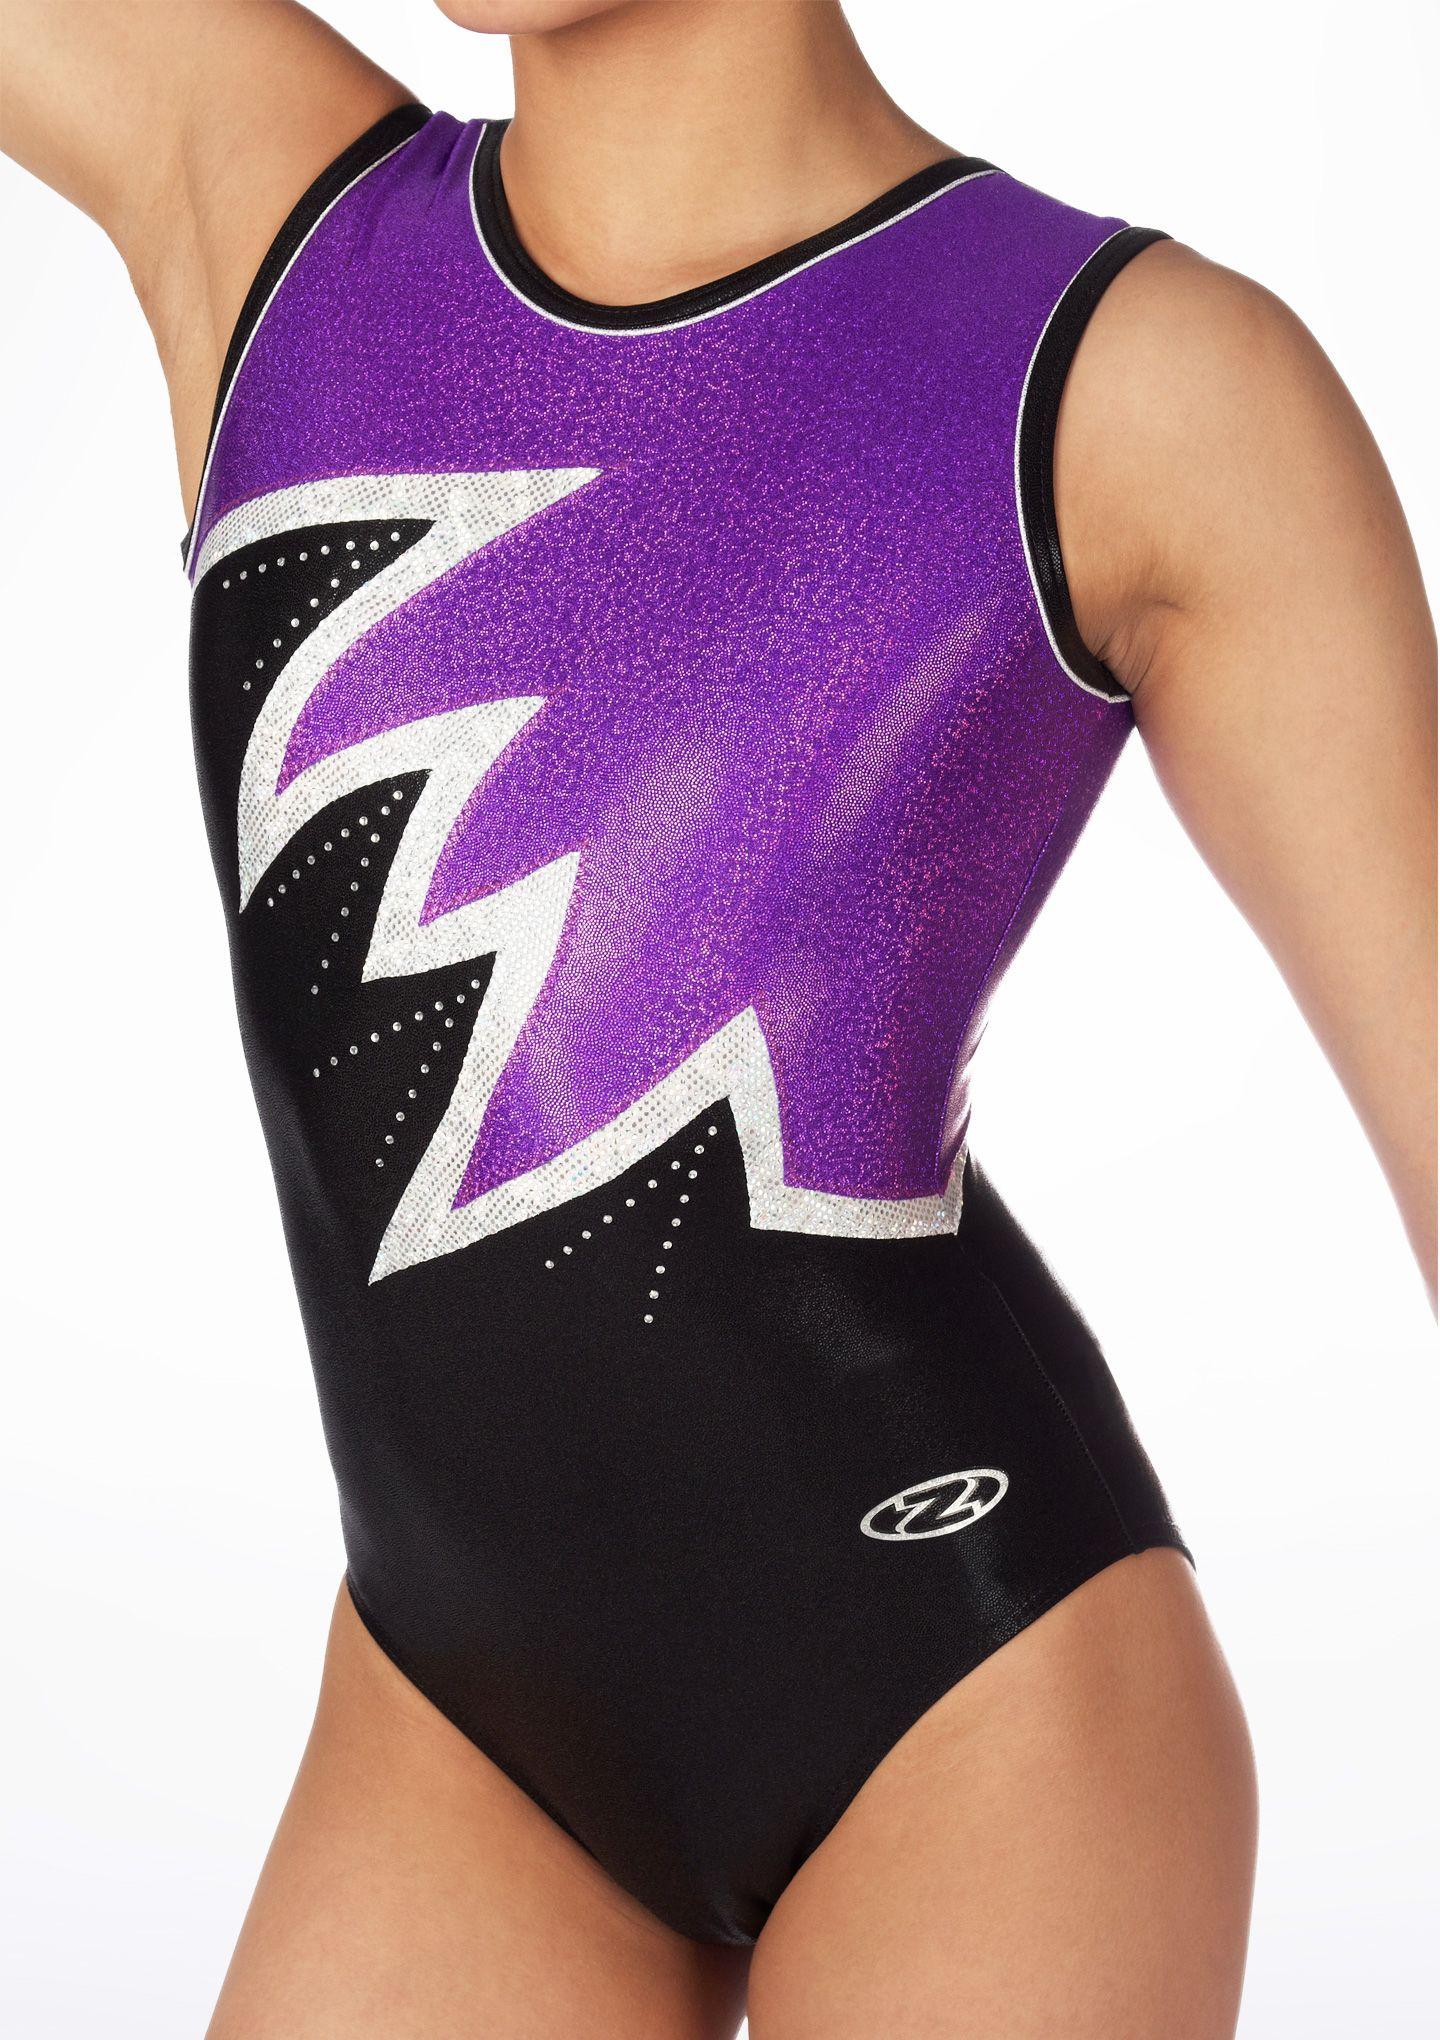 ESHOO Girls Gymnastics Leotards Metallic Shorts